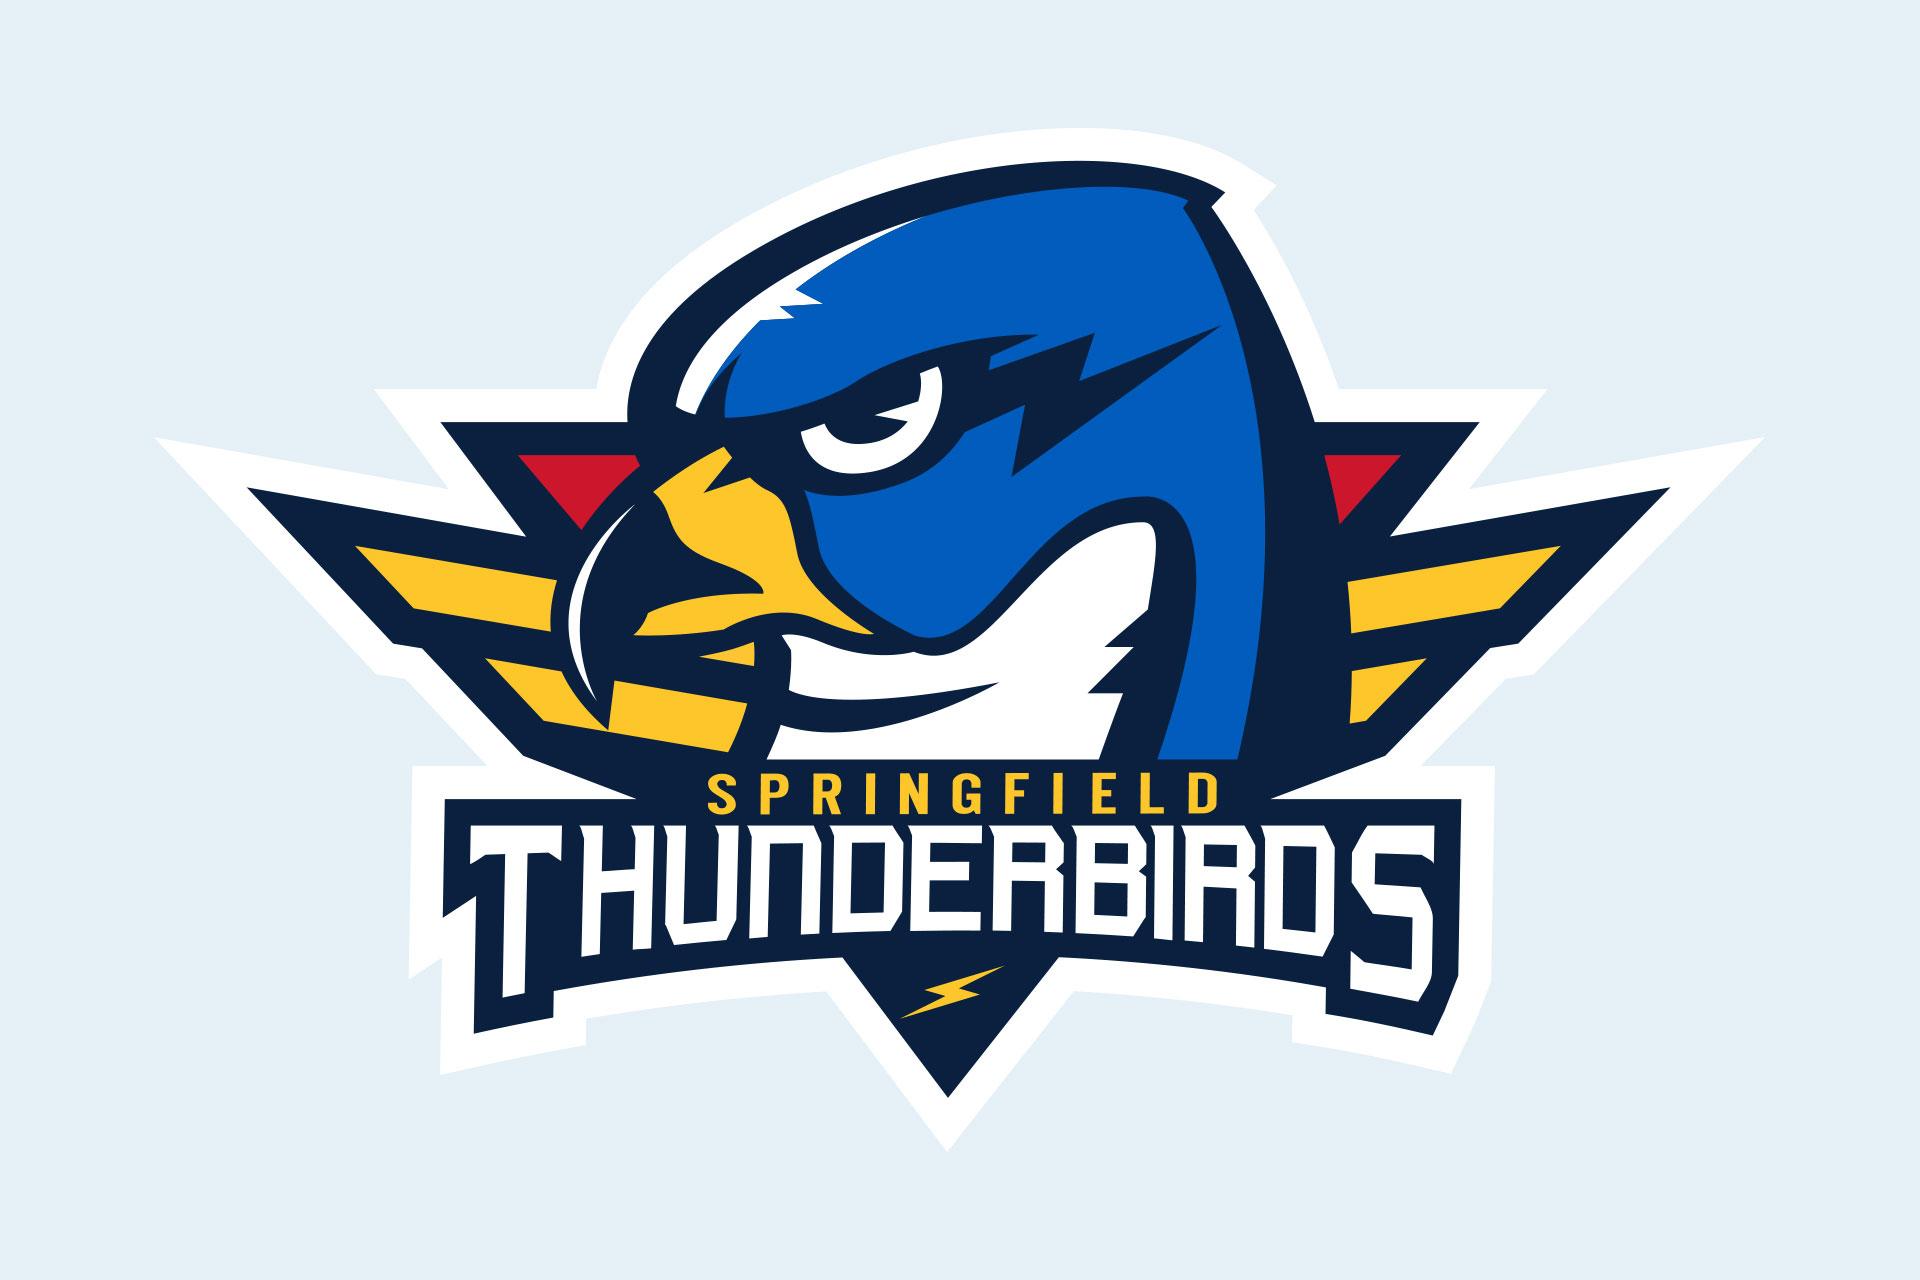 Springfield Thunderbirds logo